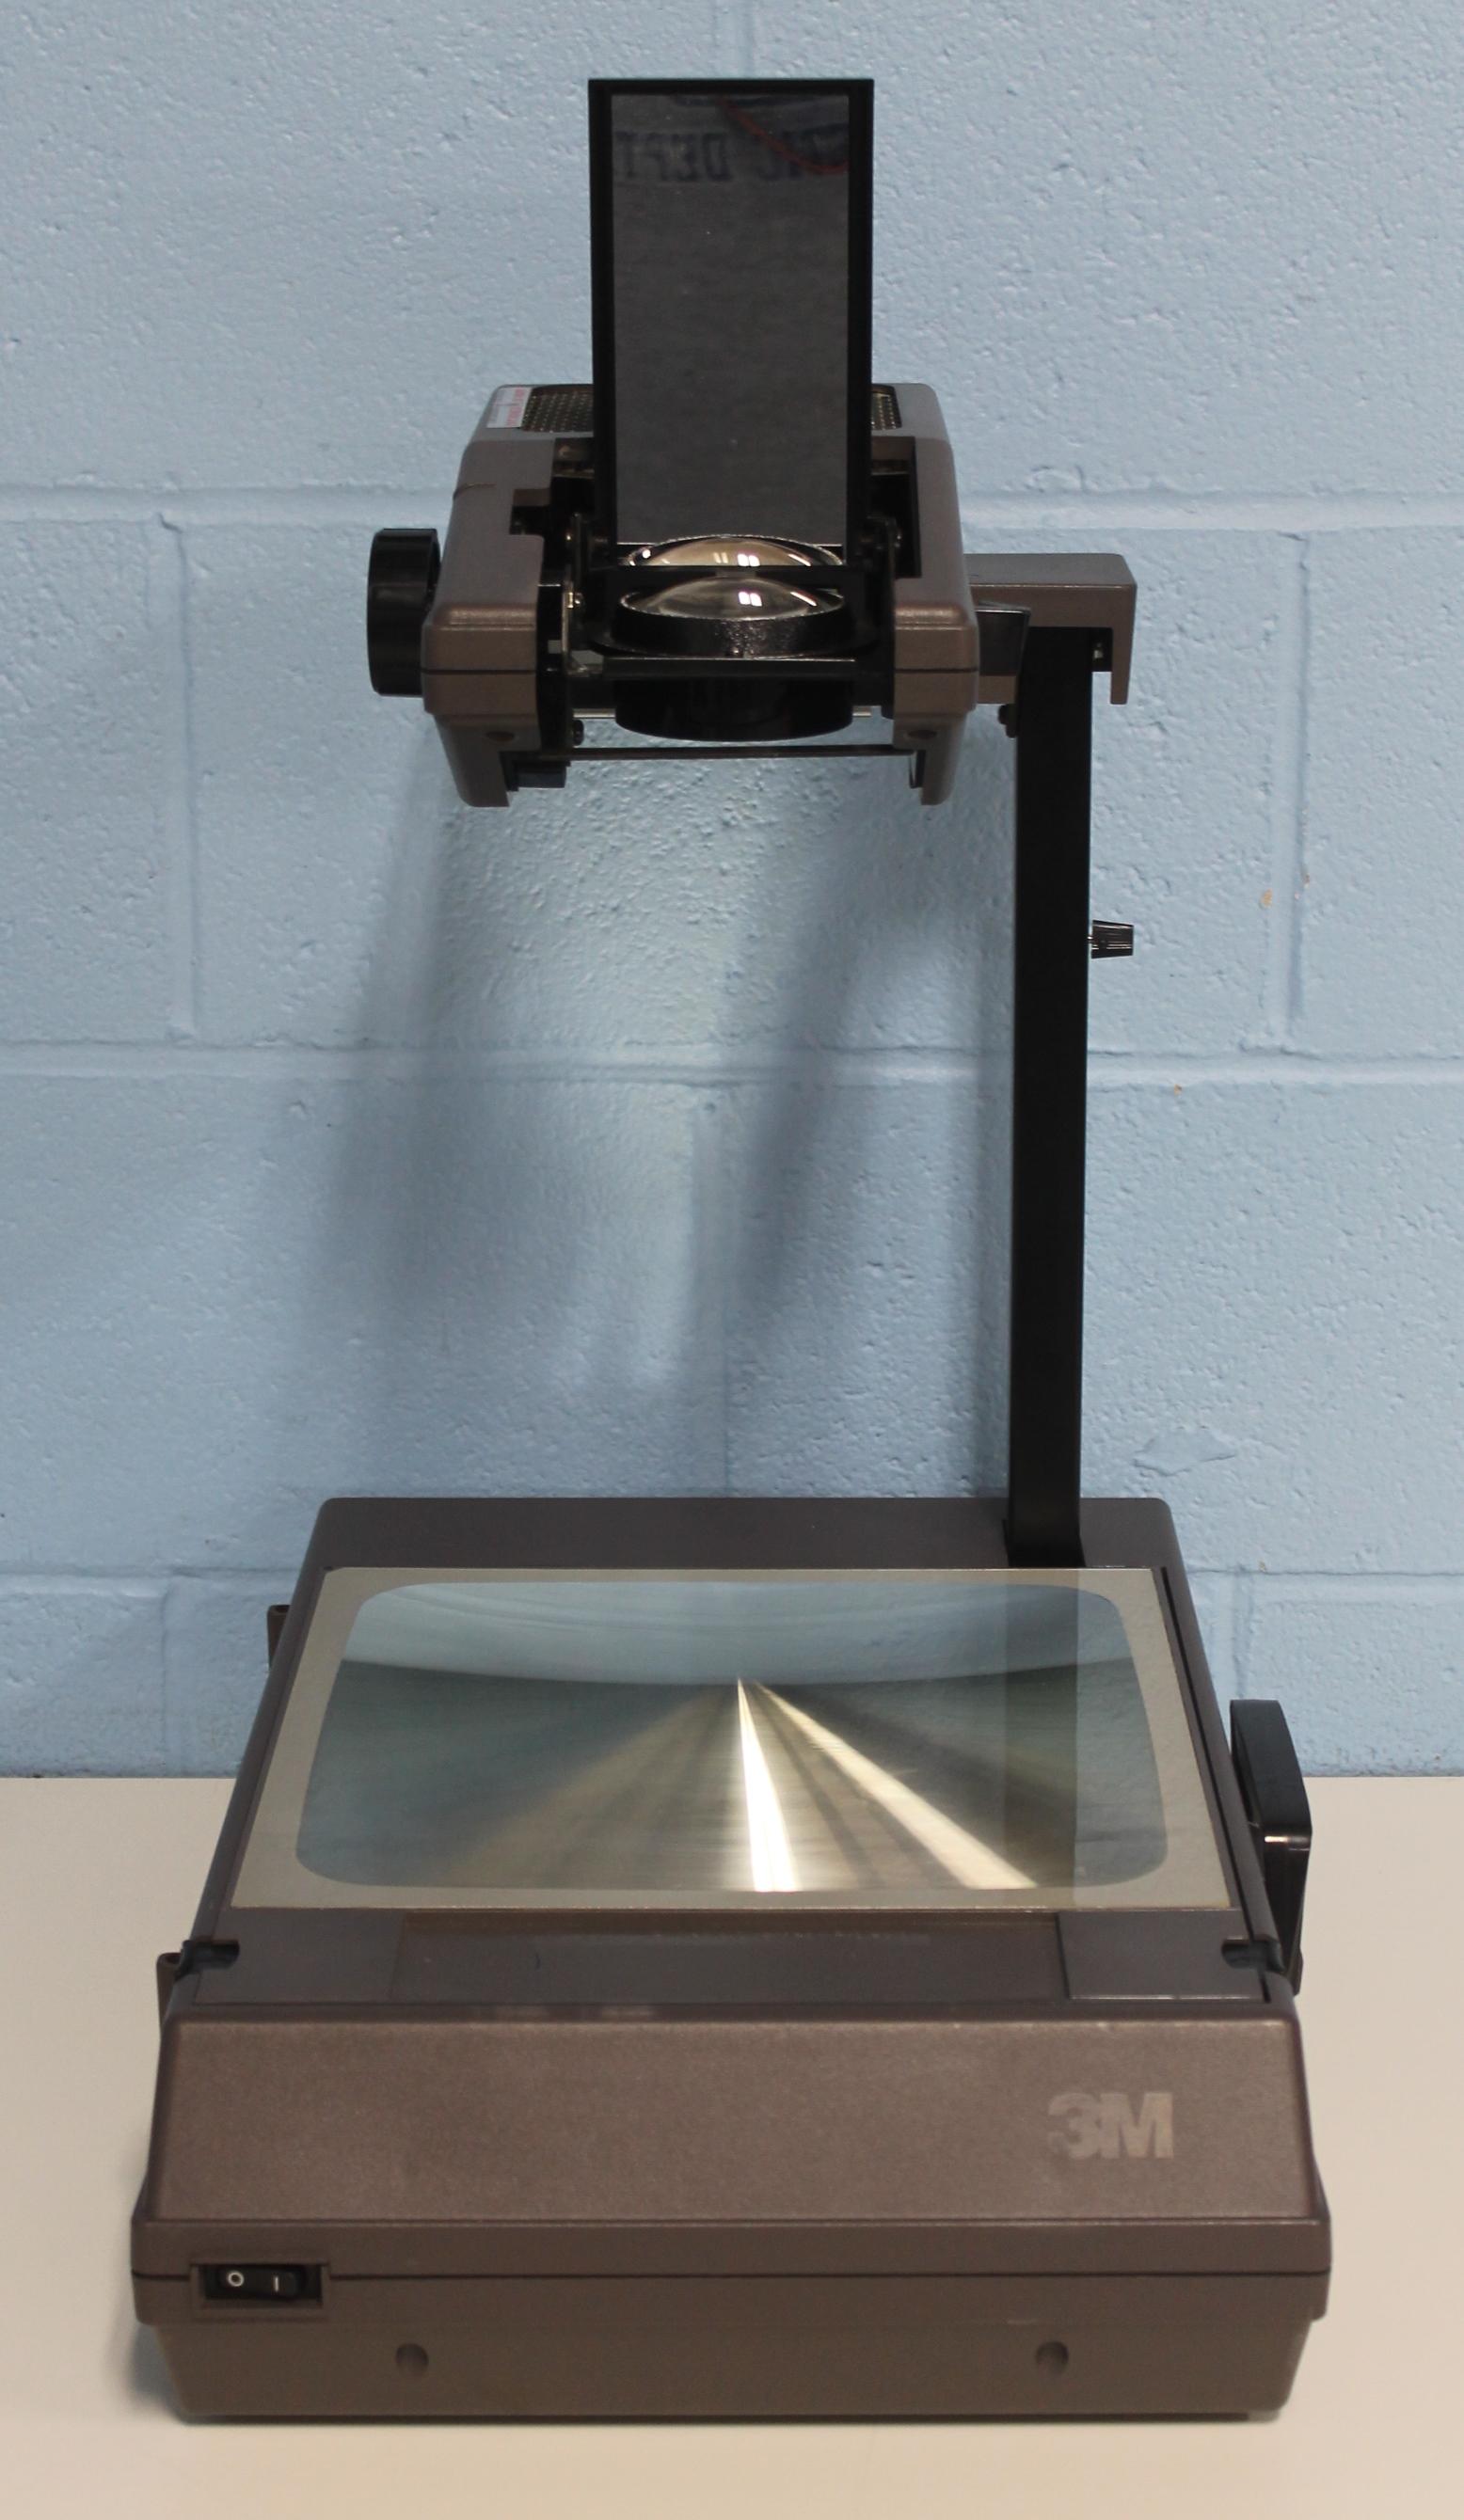 3M 2000AGT Portable Overhead Projector Ag 120V/60H Image